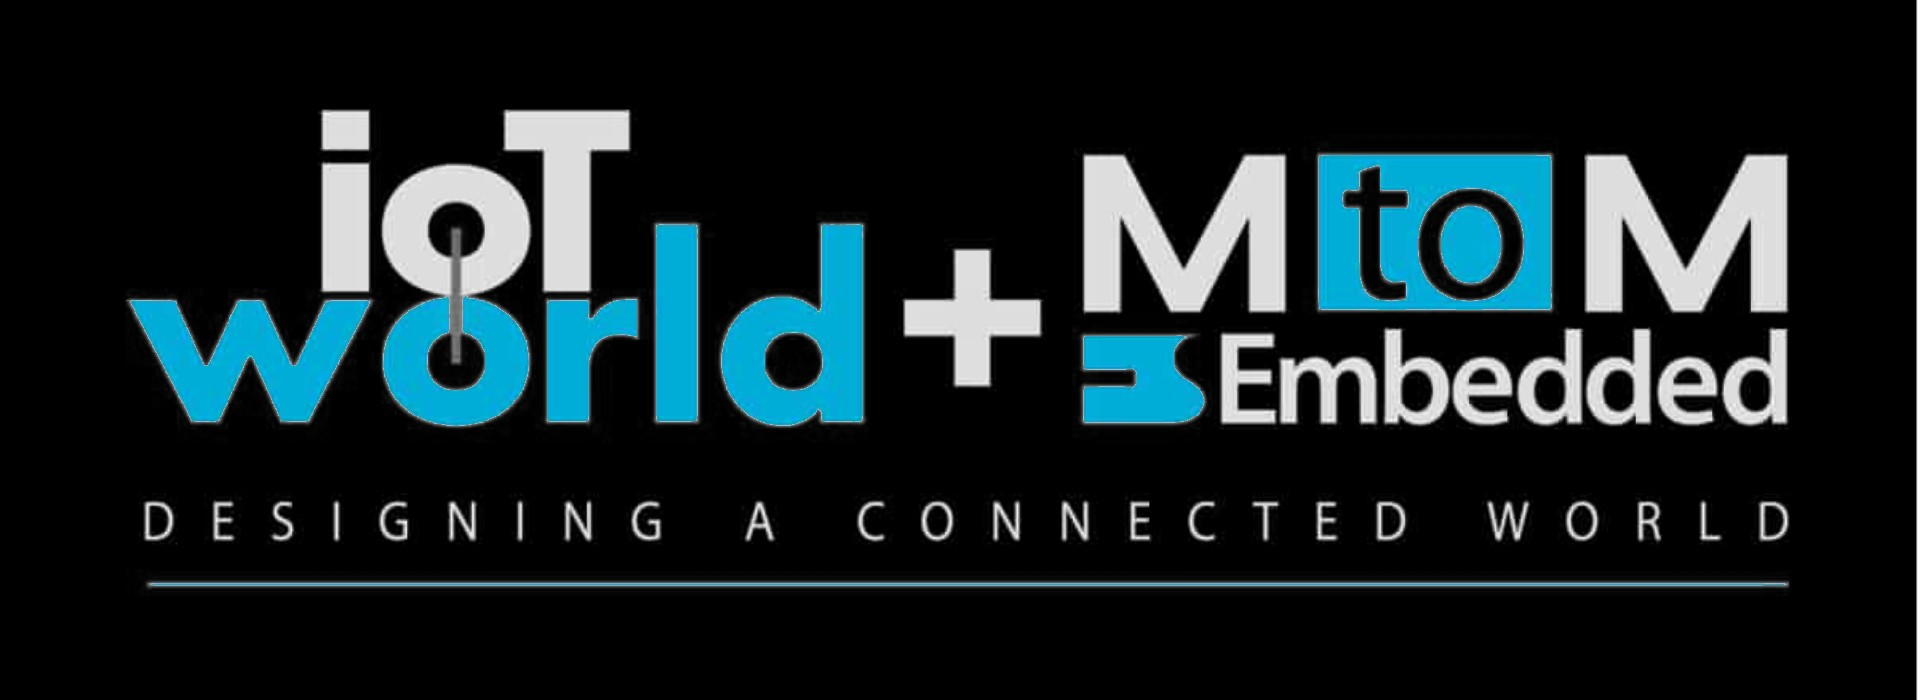 Badge gratuit salon ioT World M2M